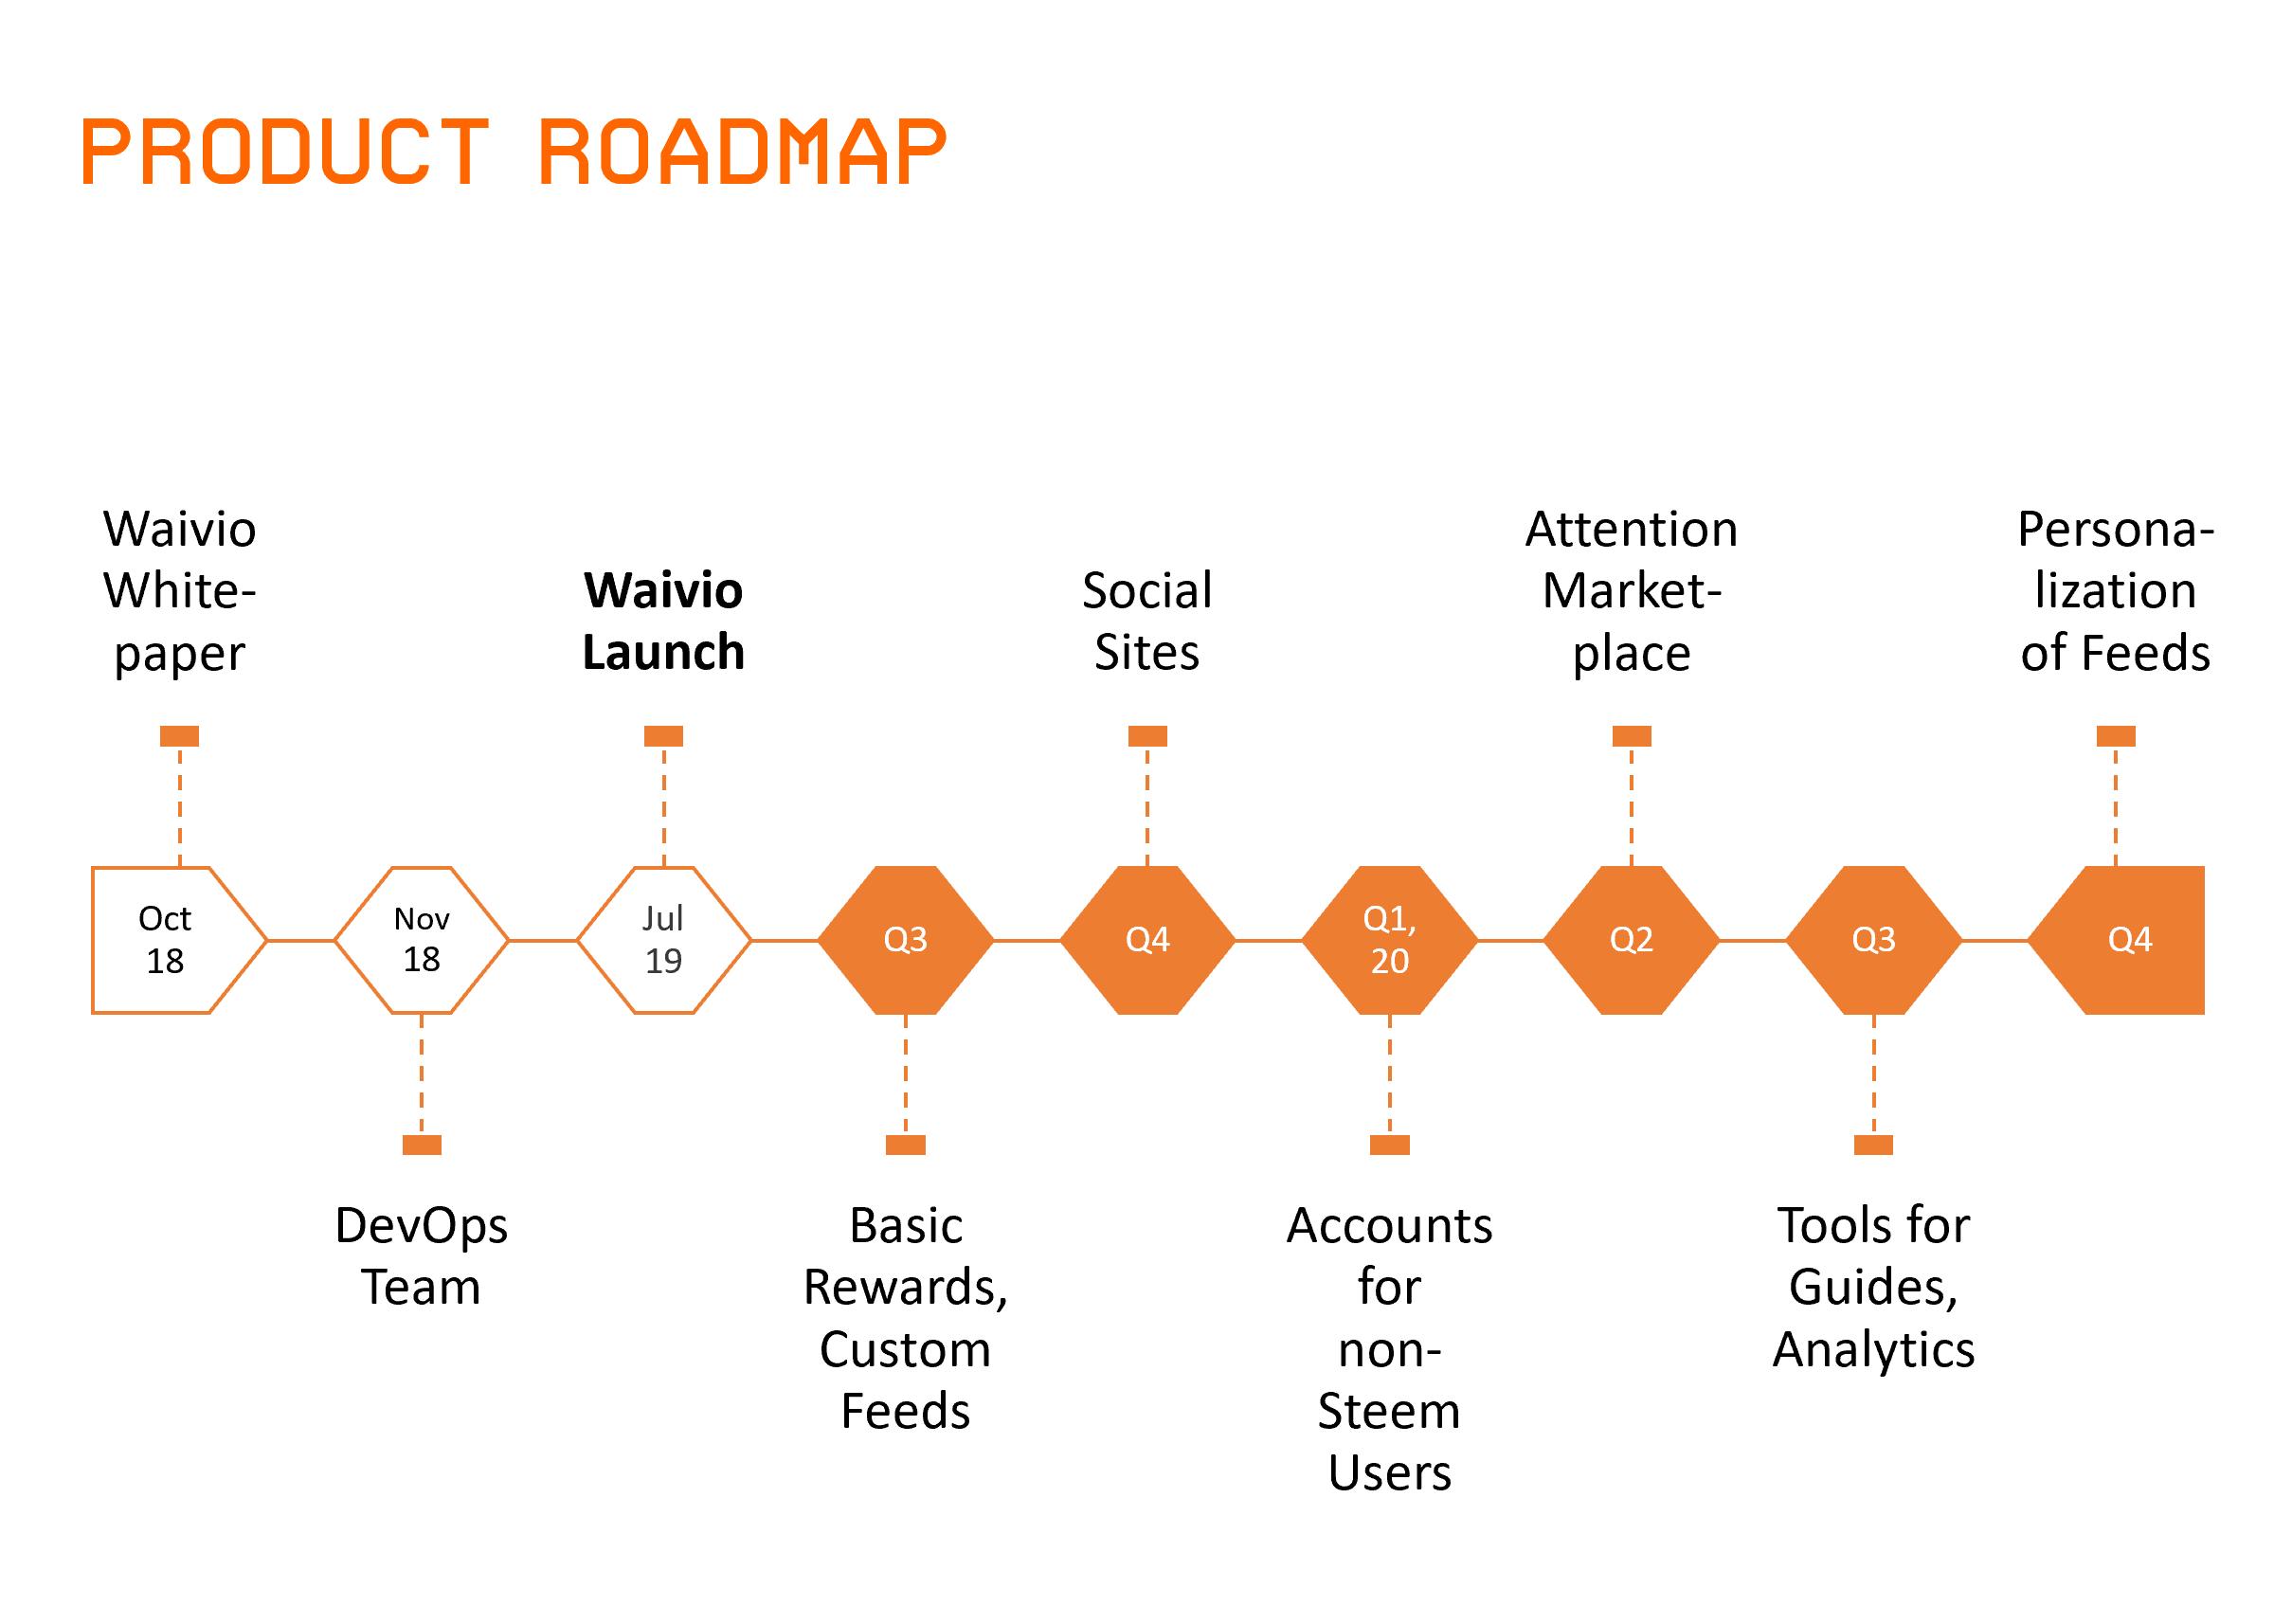 Waivio developement roadmap